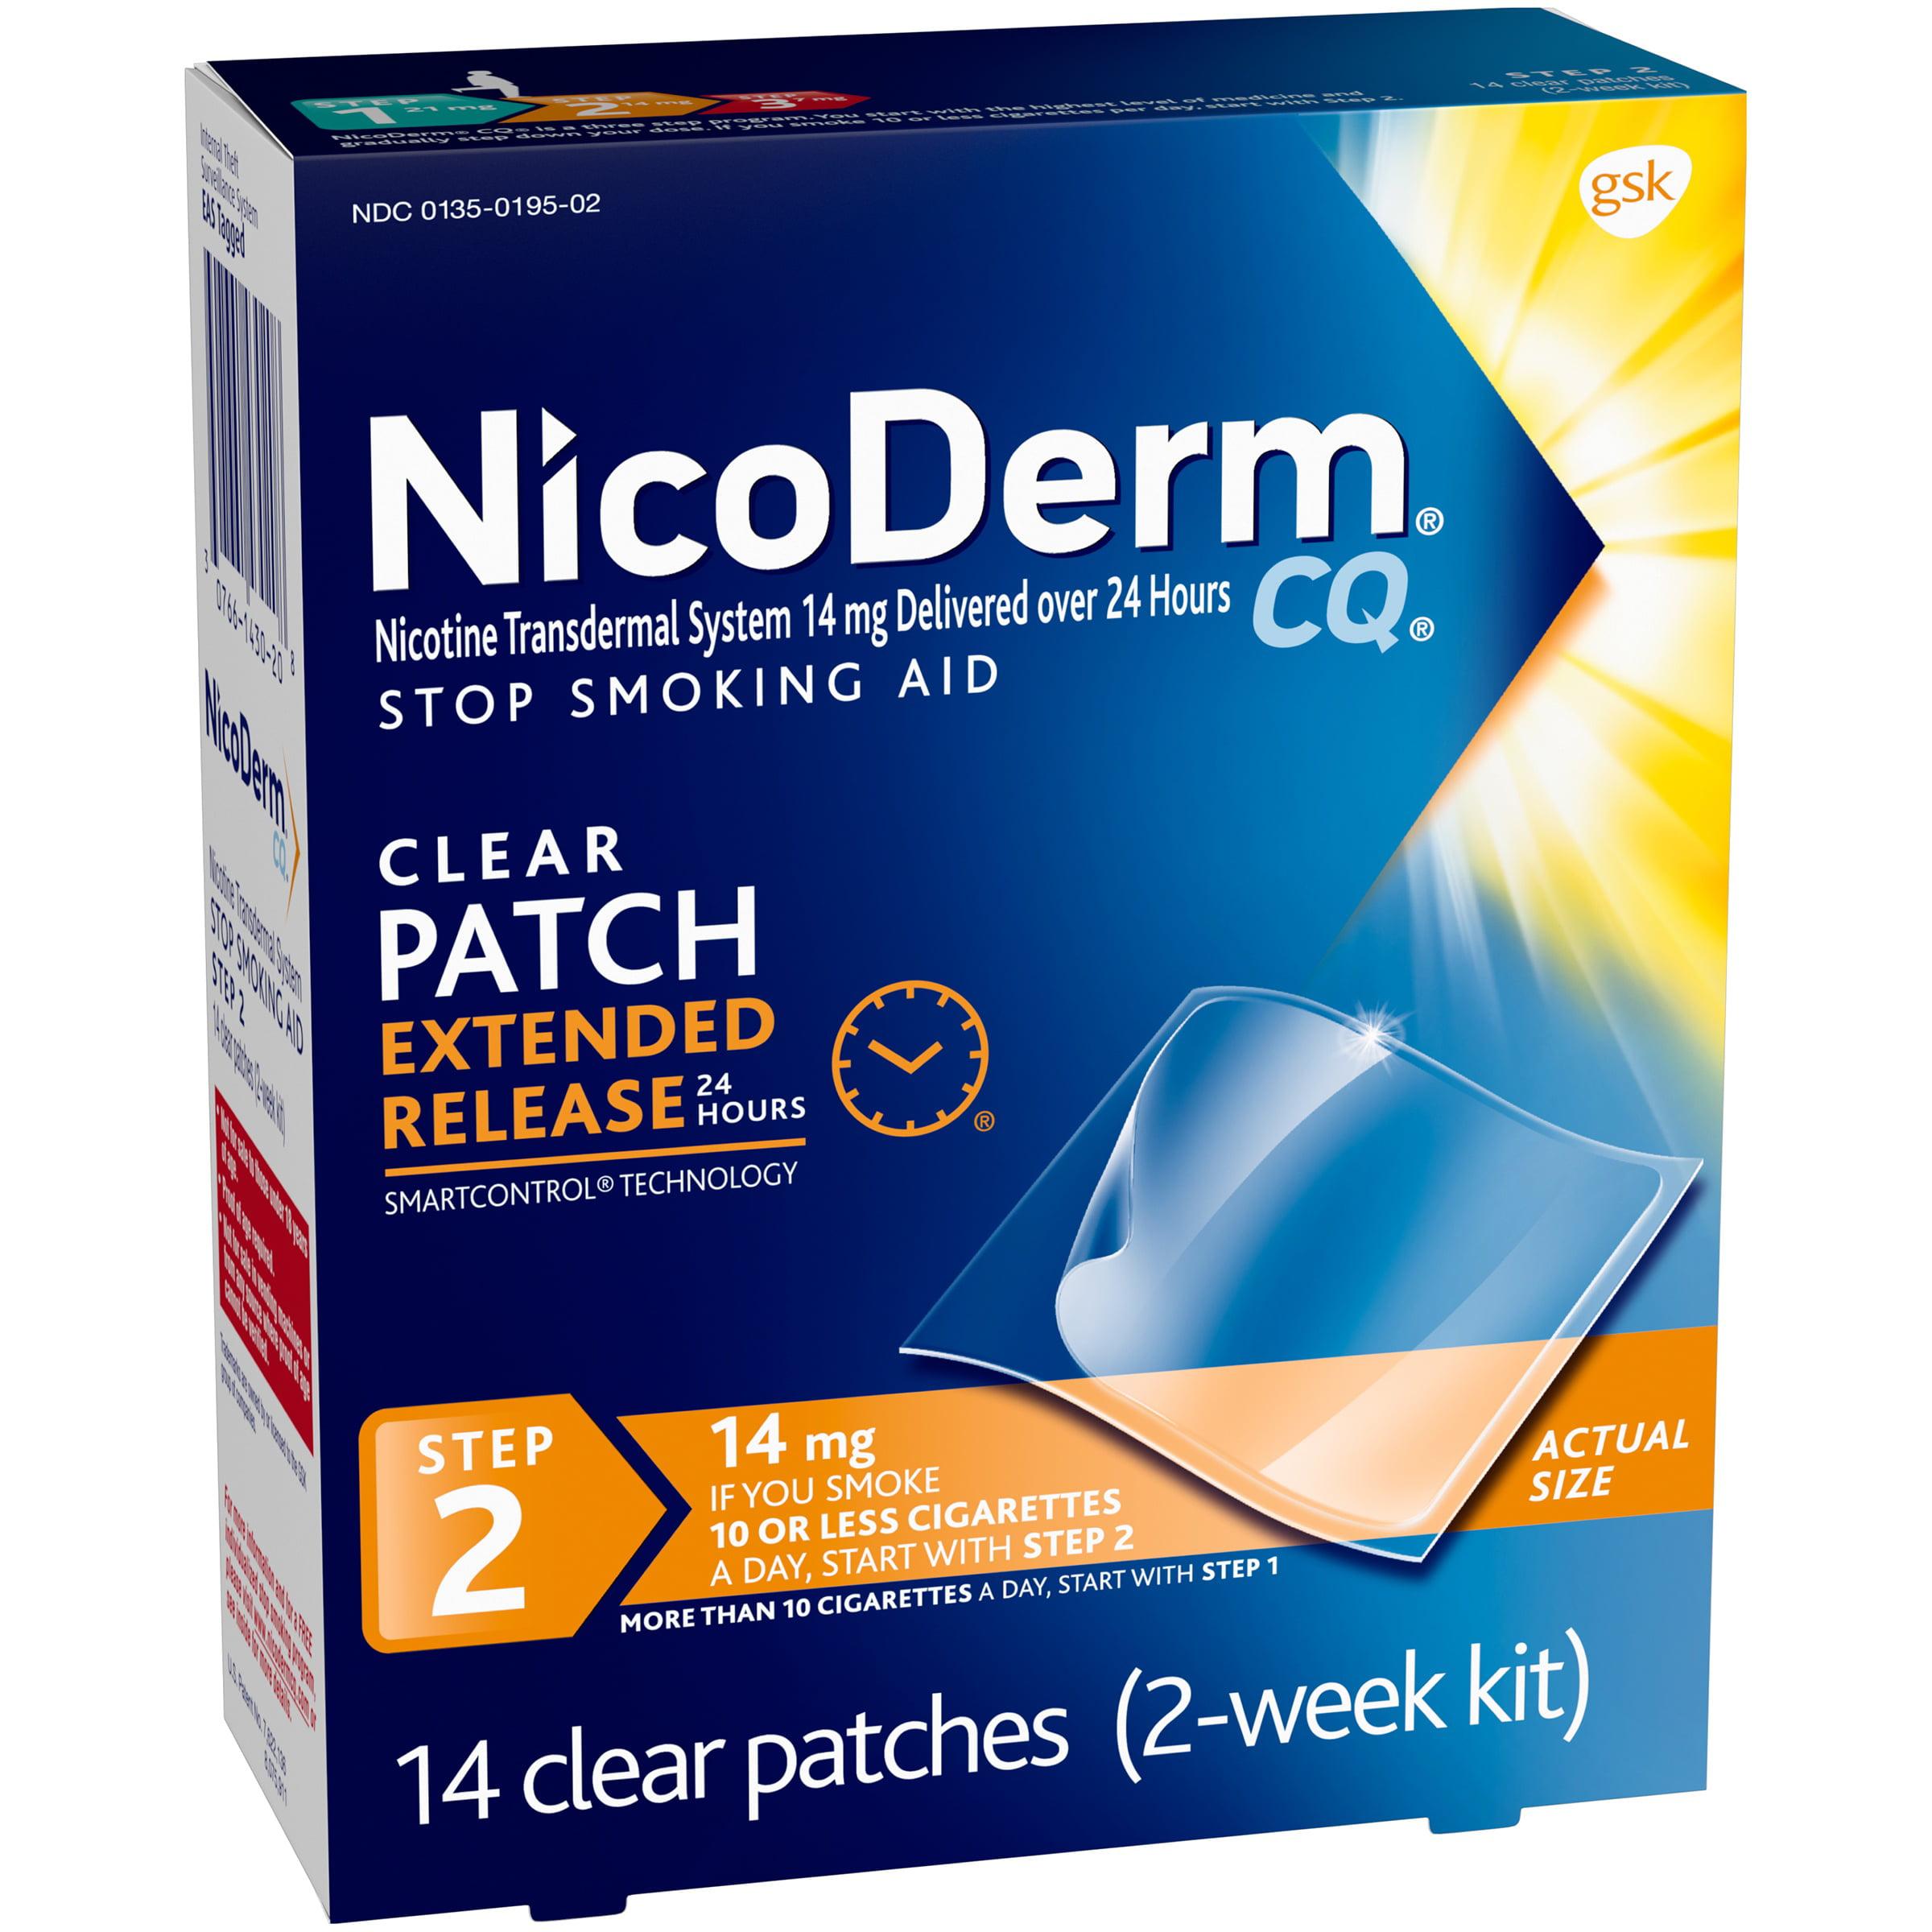 Nicoderm CQ Clear Nicotine Patch, Stop Smoking Aid, 14 mg, 14 count